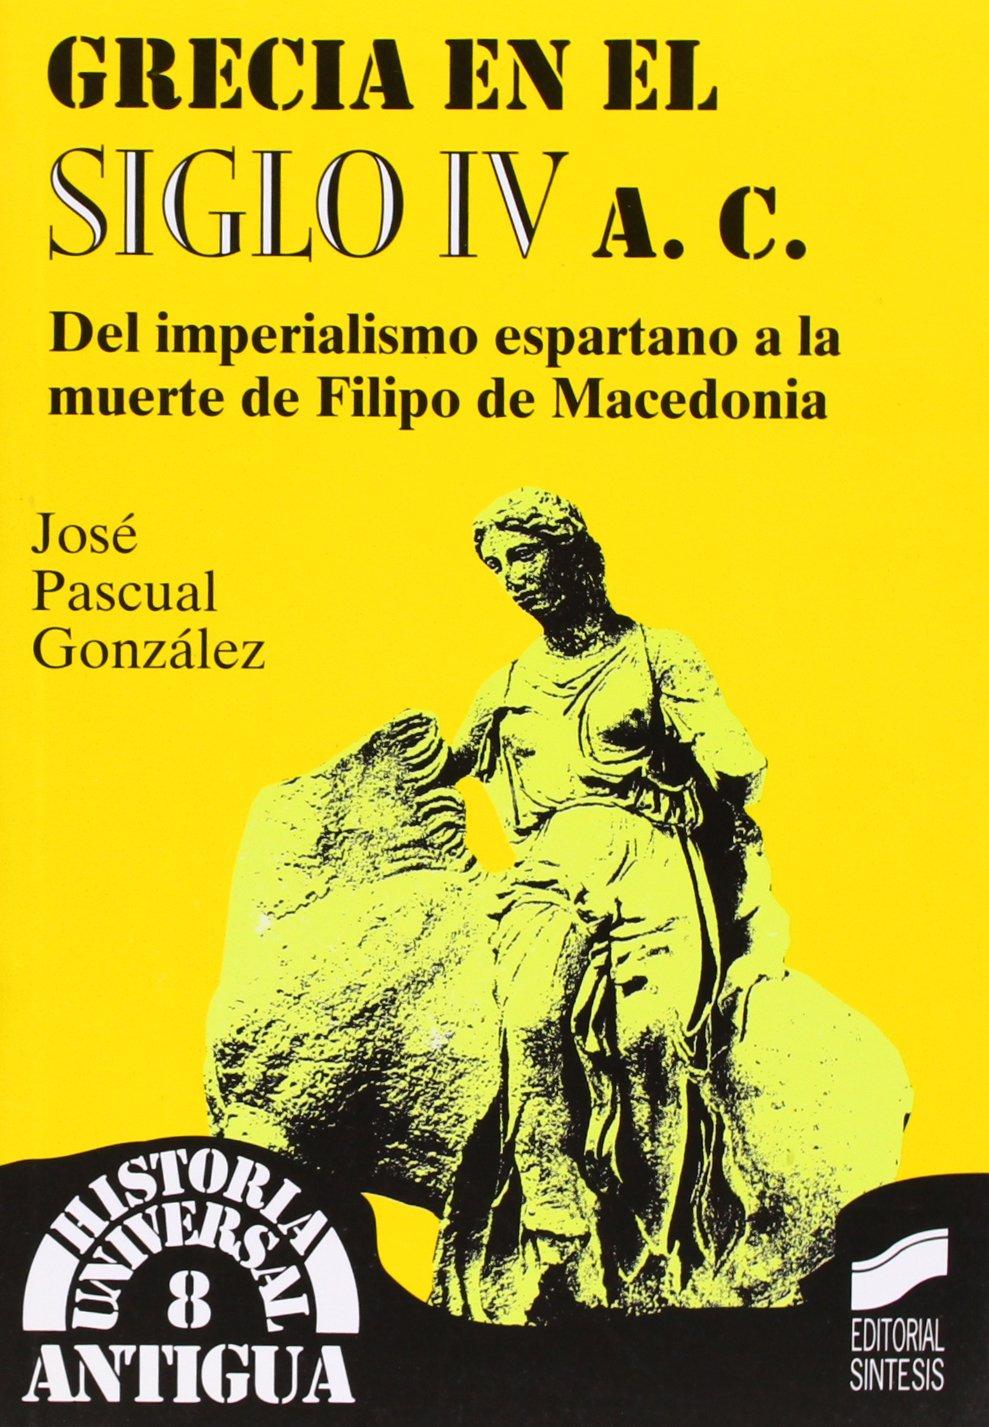 Grecia En El Siglo IV A. C. (Spanish Edition) (Spanish) Paperback –  September, 1998